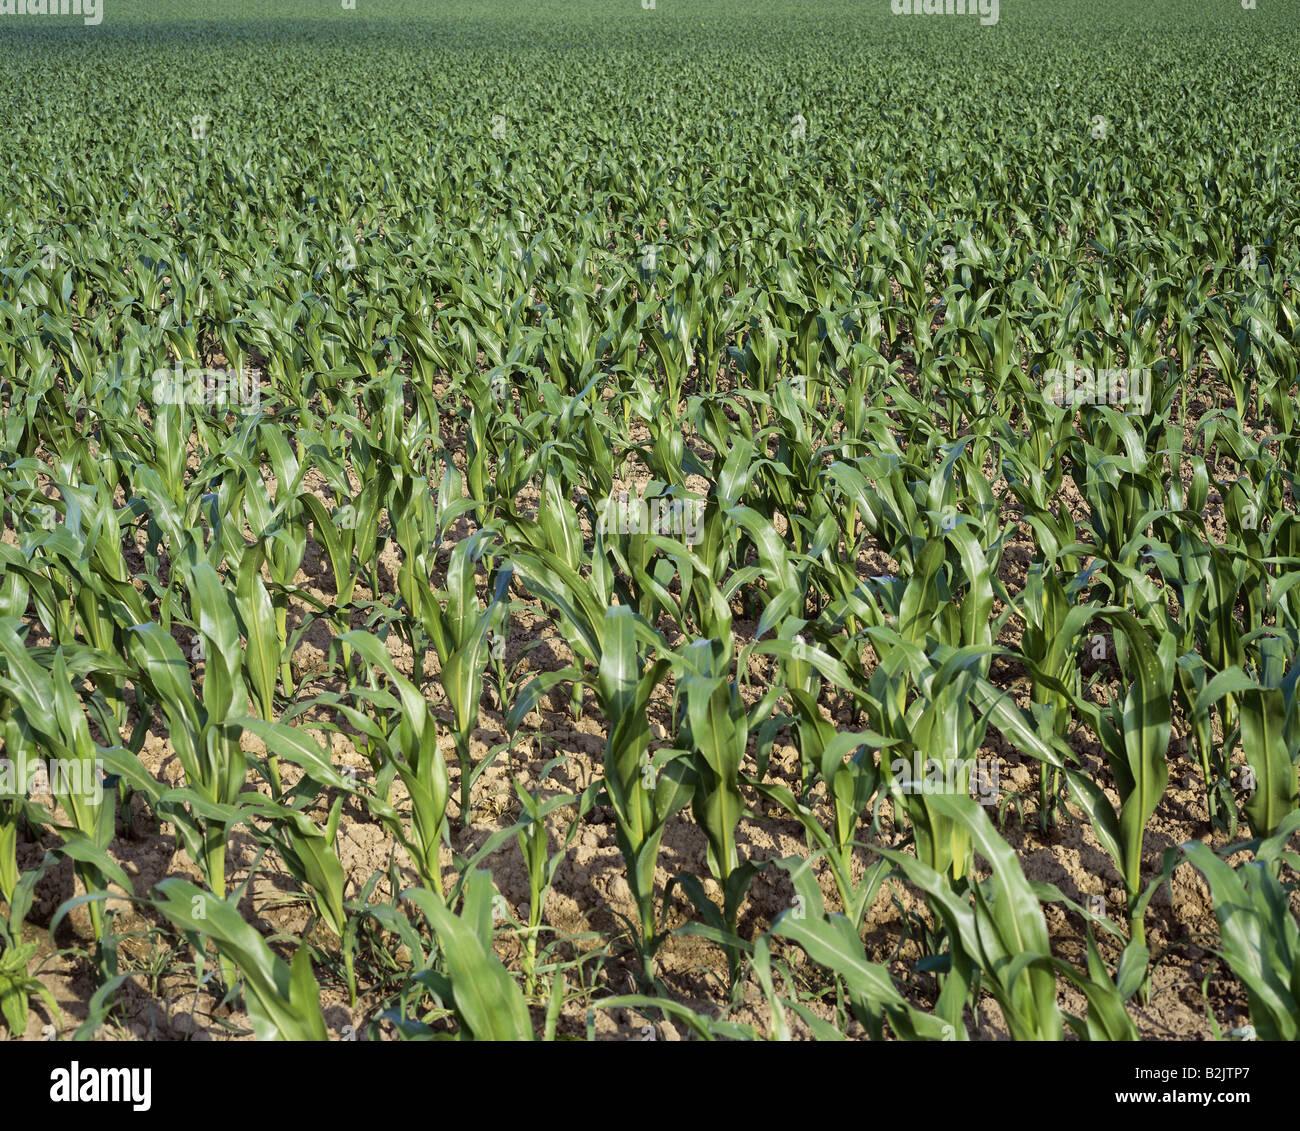 botany, Zea, 'Maize' (Zea mays), subspecies (Zea mays ssp. mays), field, seedlings, Kamen, Germany, Additional - Stock Image